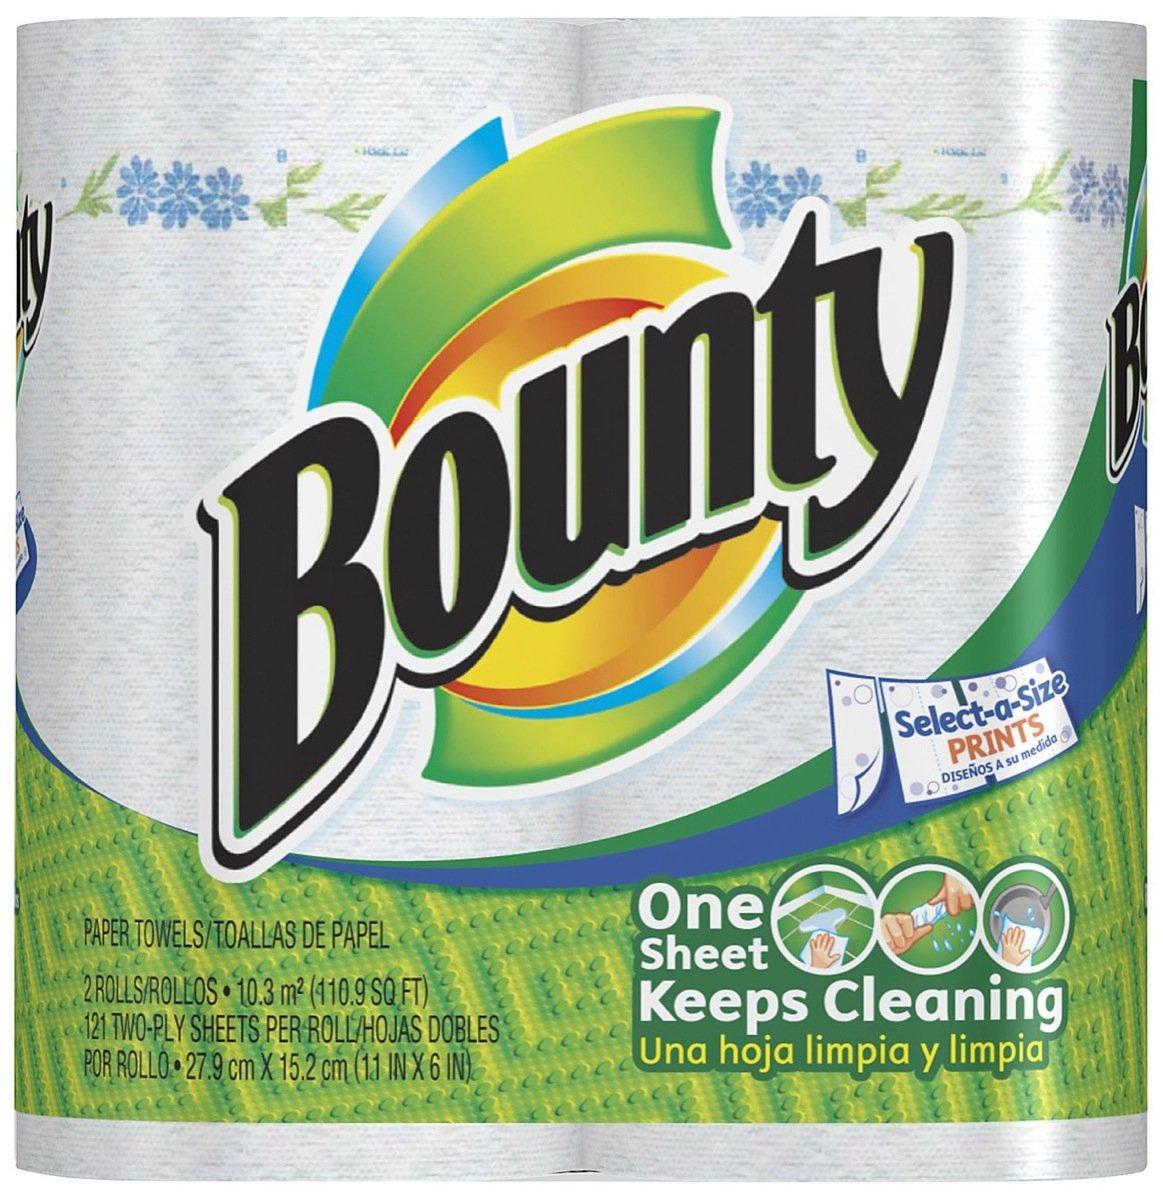 Amazon.com: Bounty Value Roll, 2 Ply, Prints, 2 ct: Health & Personal Care